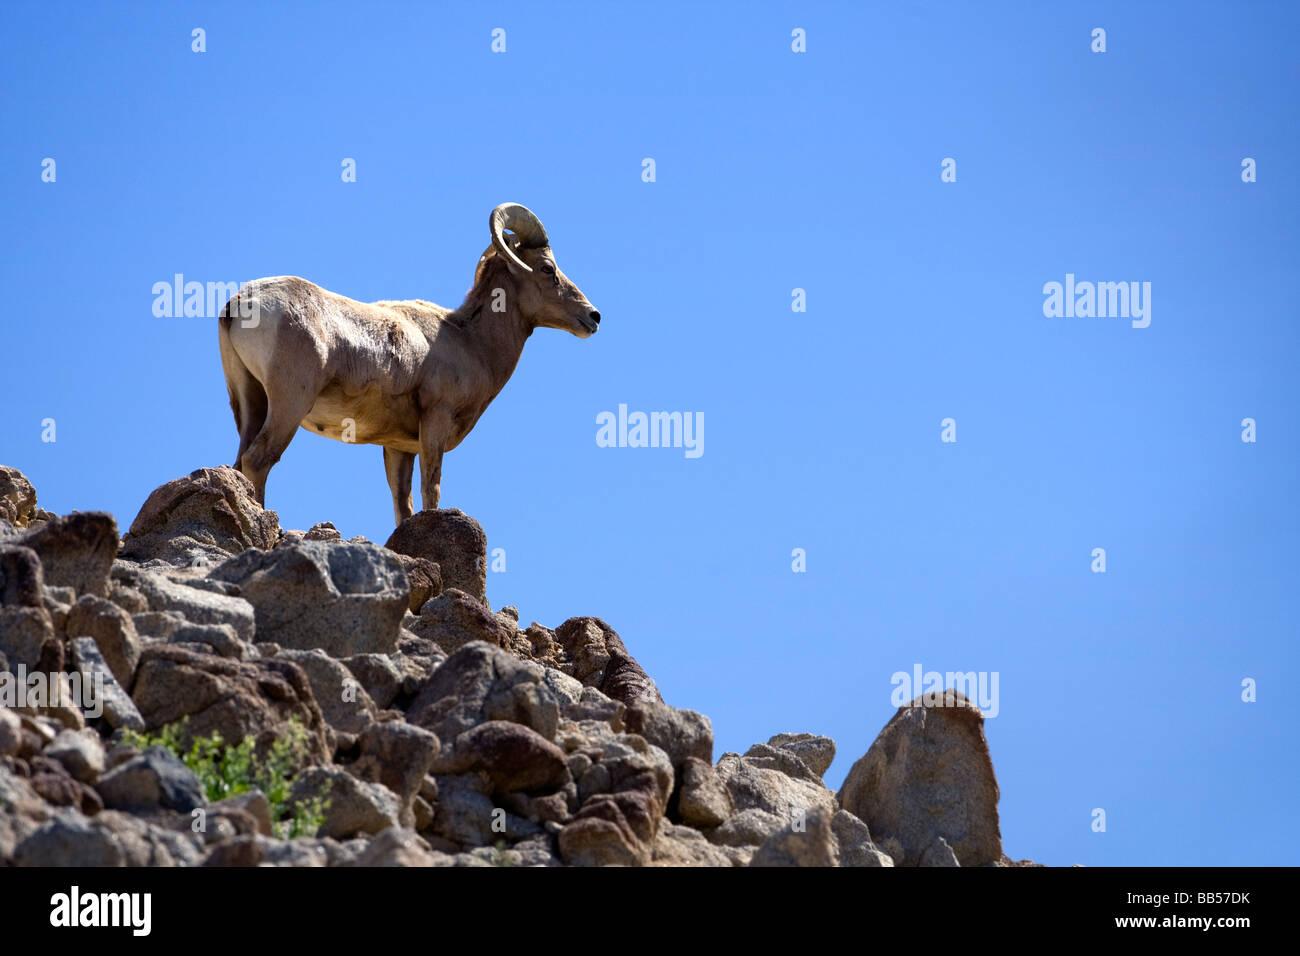 Big Horn Sheep in Anza Borrego Desert State Park, California. - Stock Image